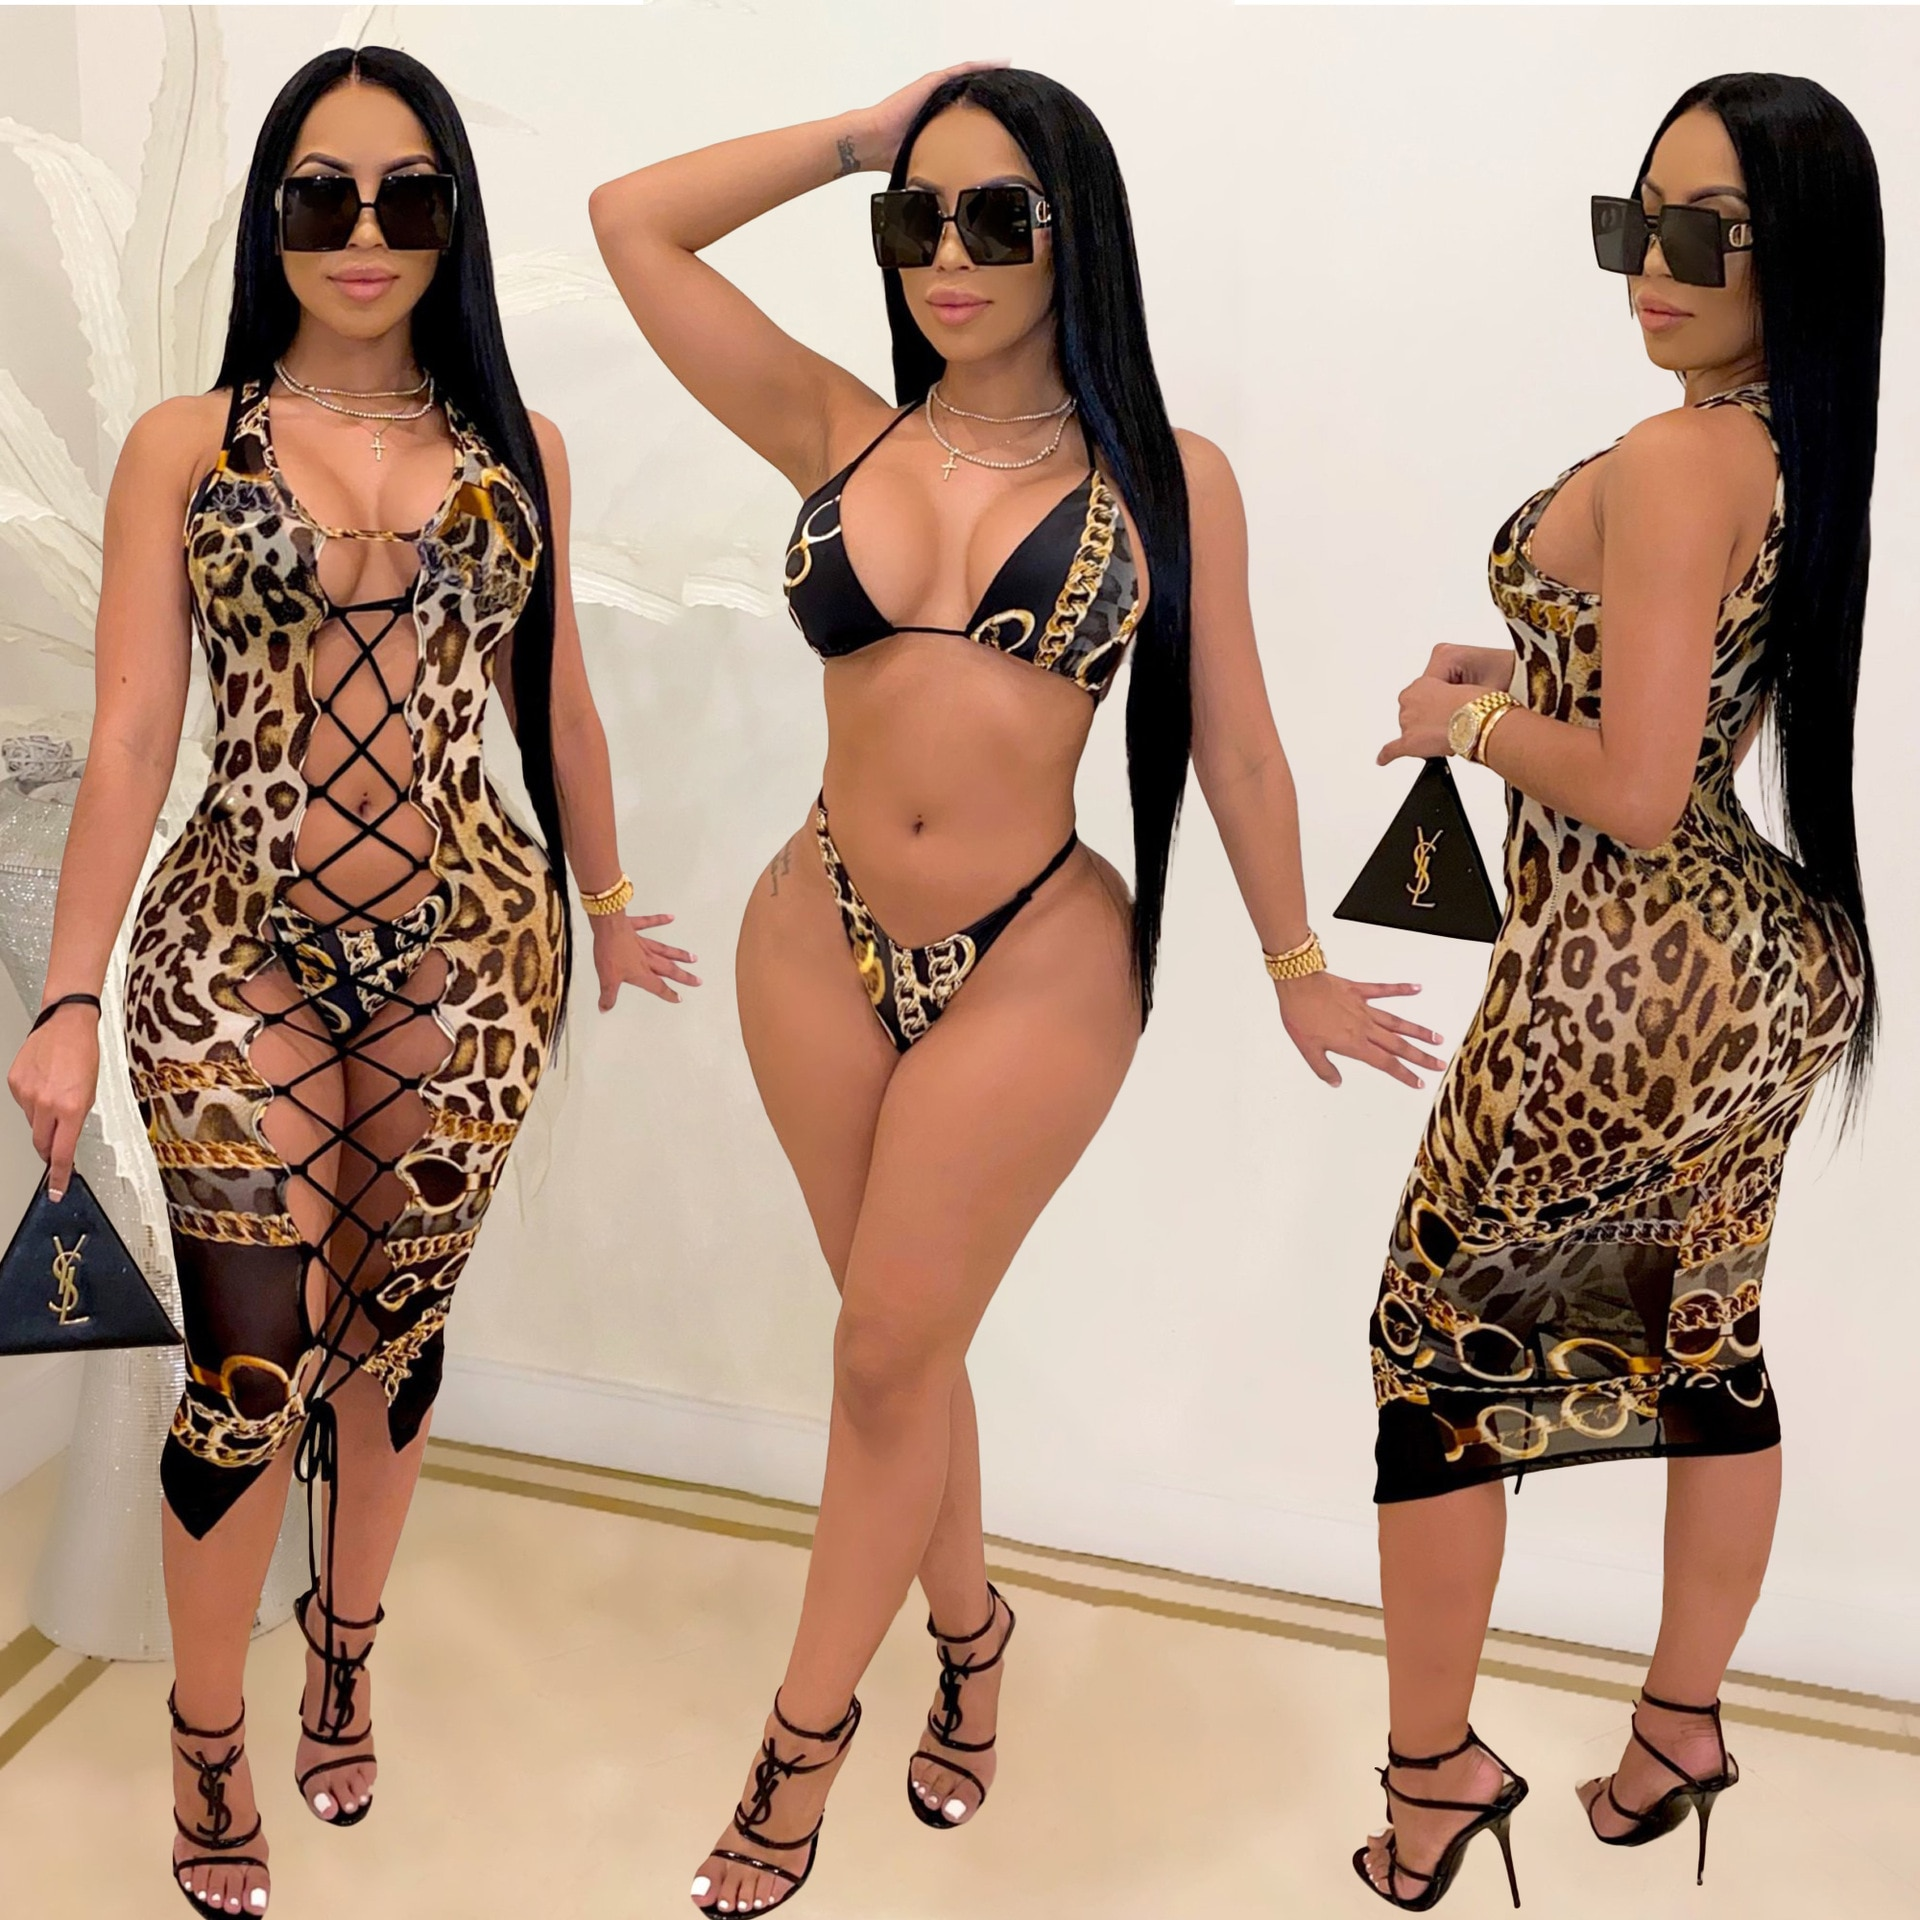 Adogirl Bikini Wear Leopard Print Women Sexy 3 Piece Set Dress Swimsuit Underwear Lace Up Hollow Out Sleeveless Midi Cover-ups